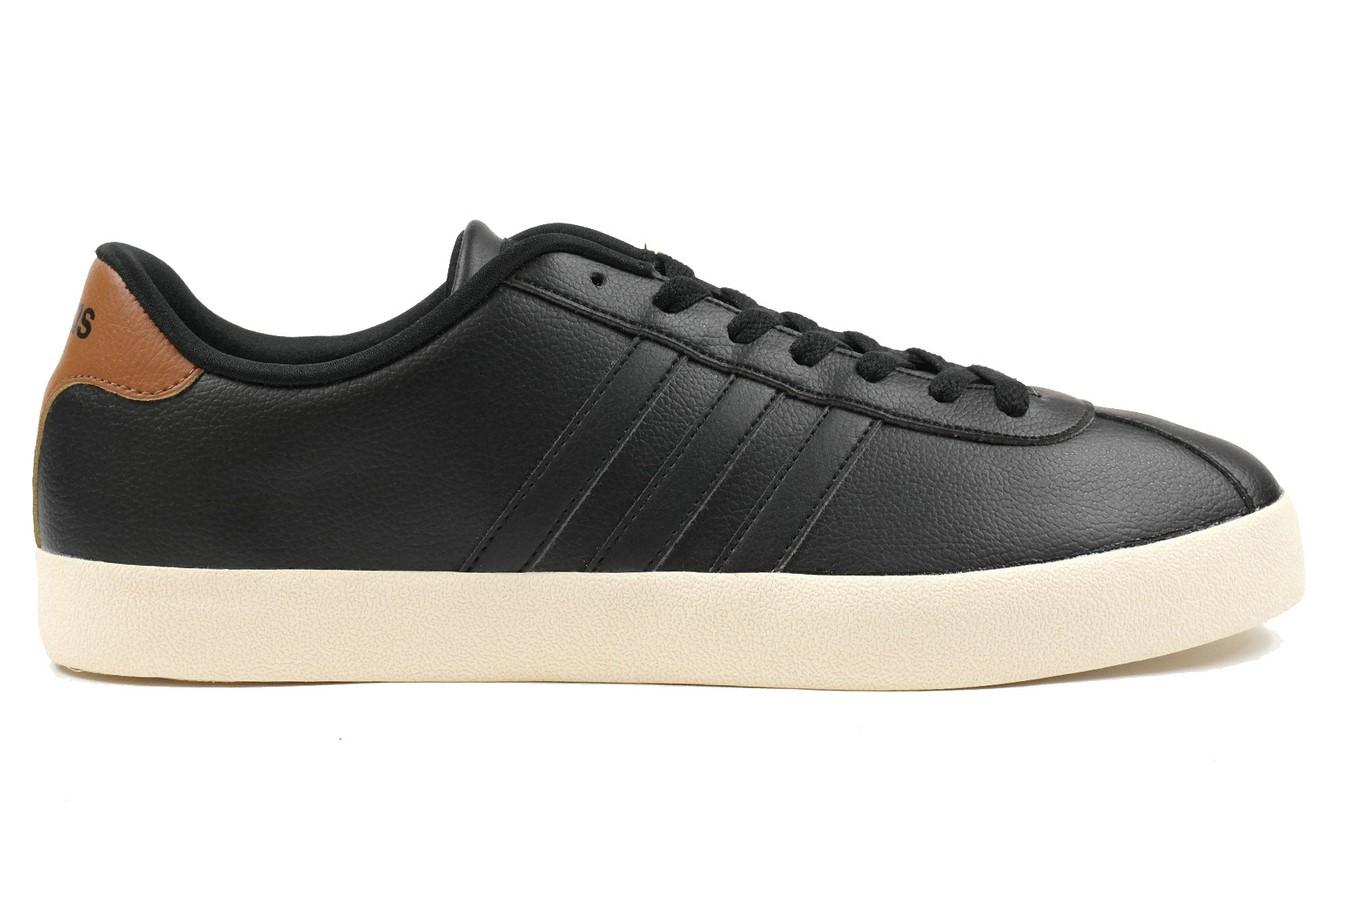 Adidas Vl Court Vulc Heren sneakers